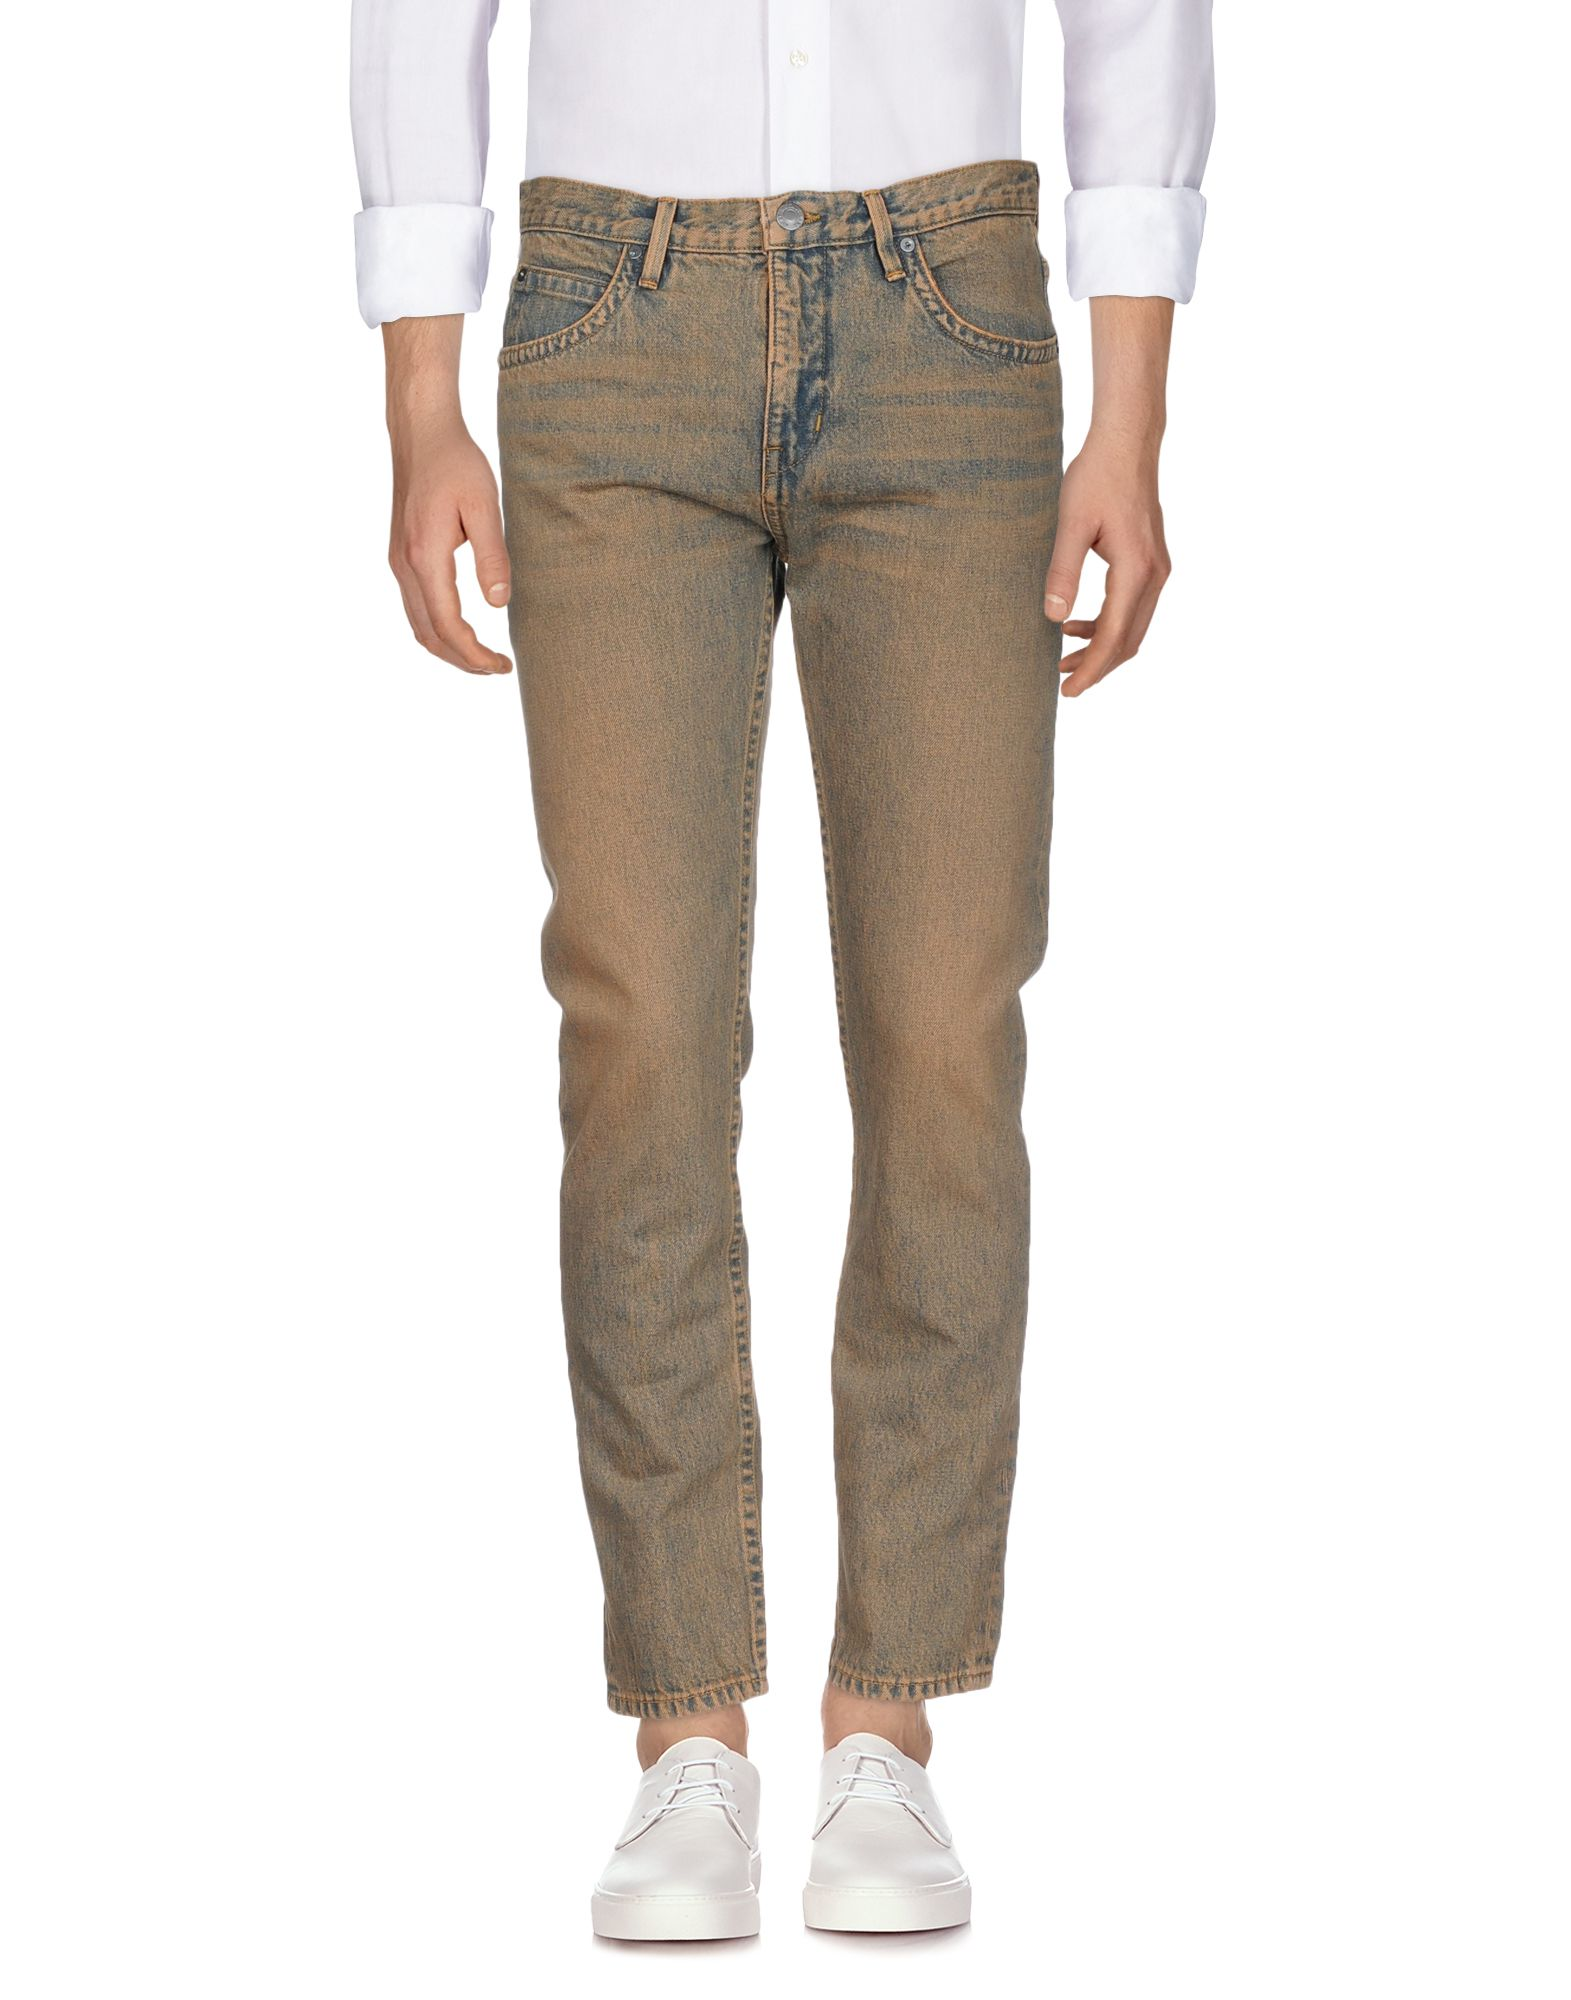 Pantaloni Jeans Helmut Lang Uomo - Acquista online su